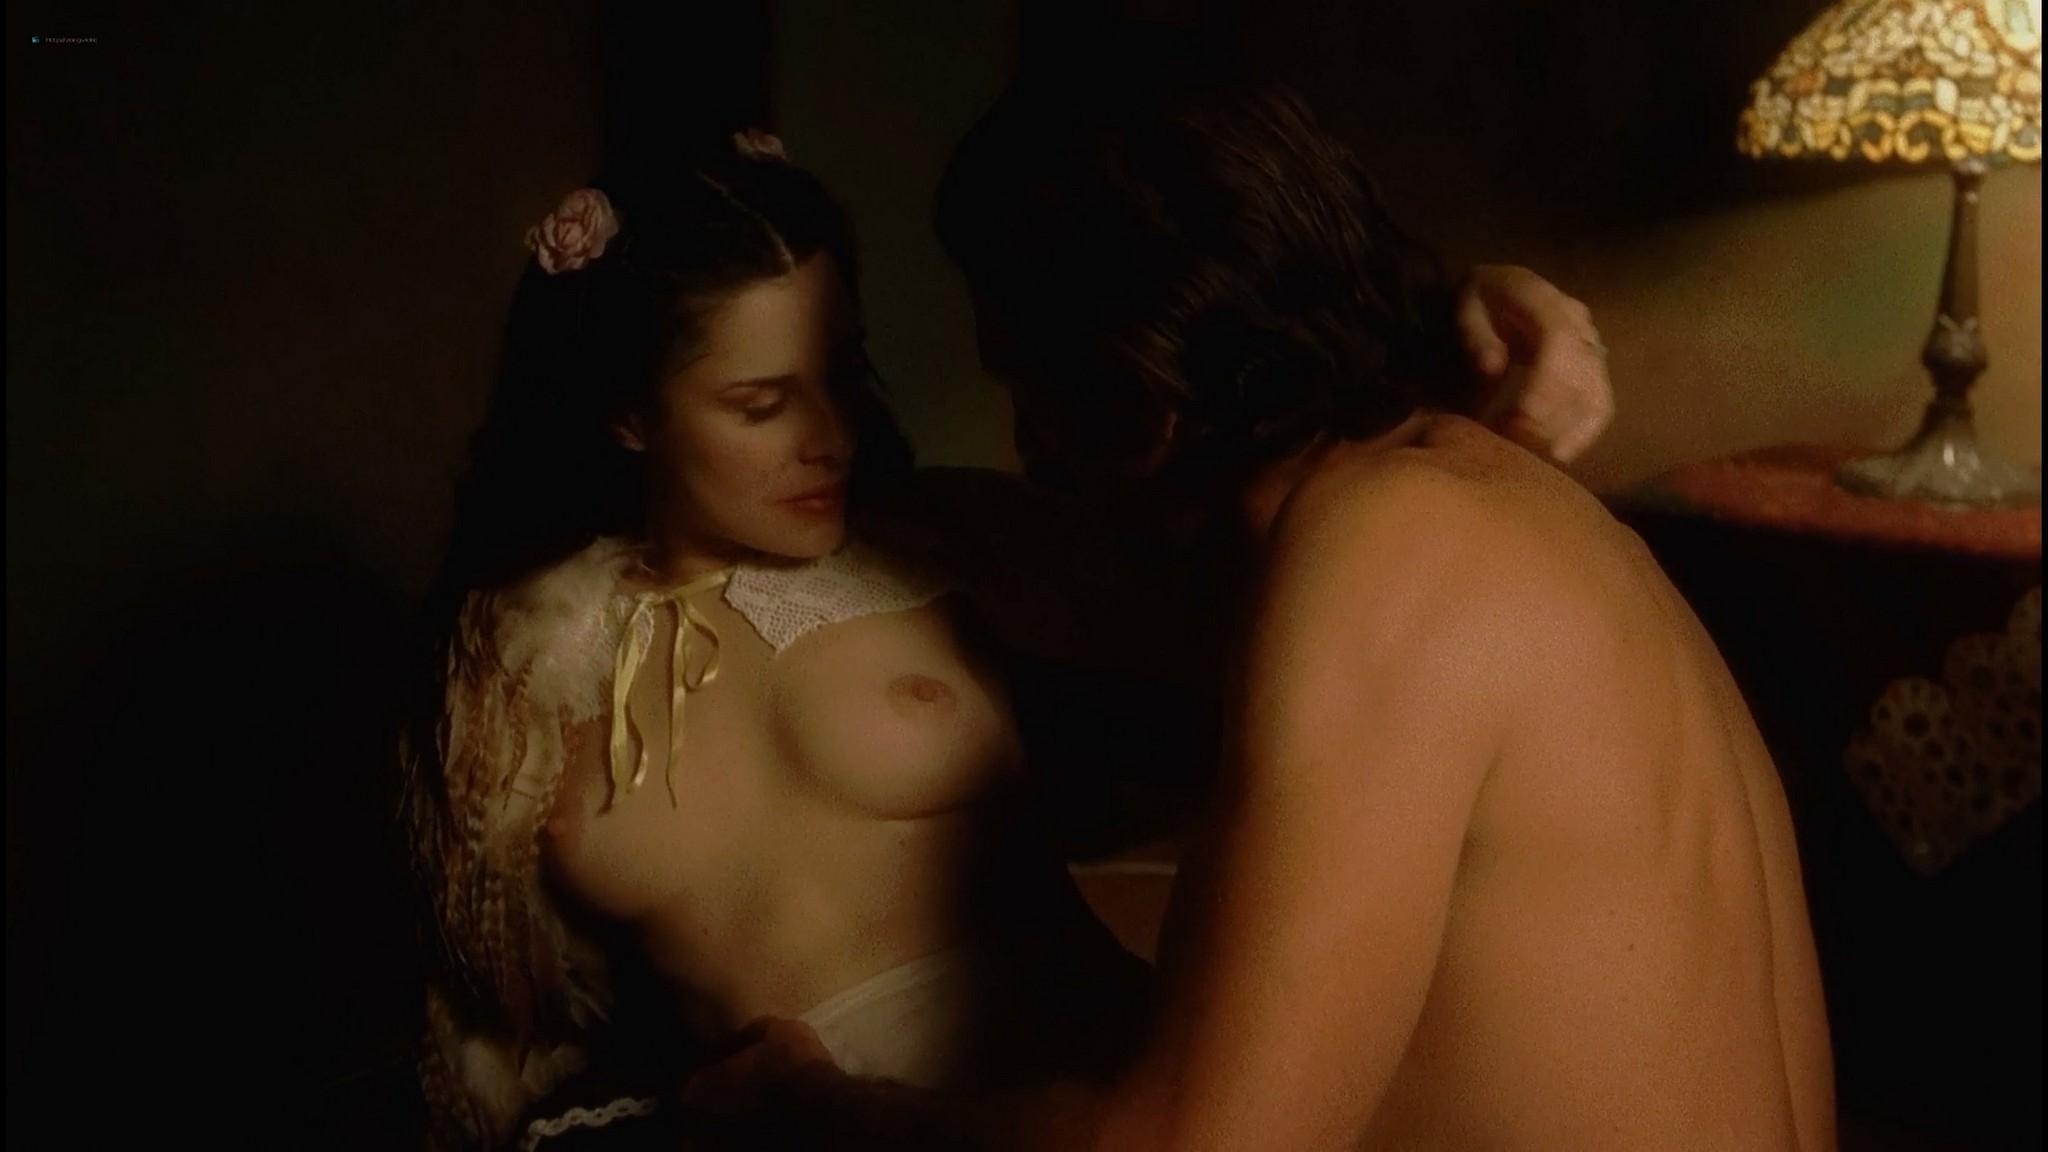 Serena Scott Thomas nude sex Sarah Lassez and others nude too Brothel 2008 1080p Web 9